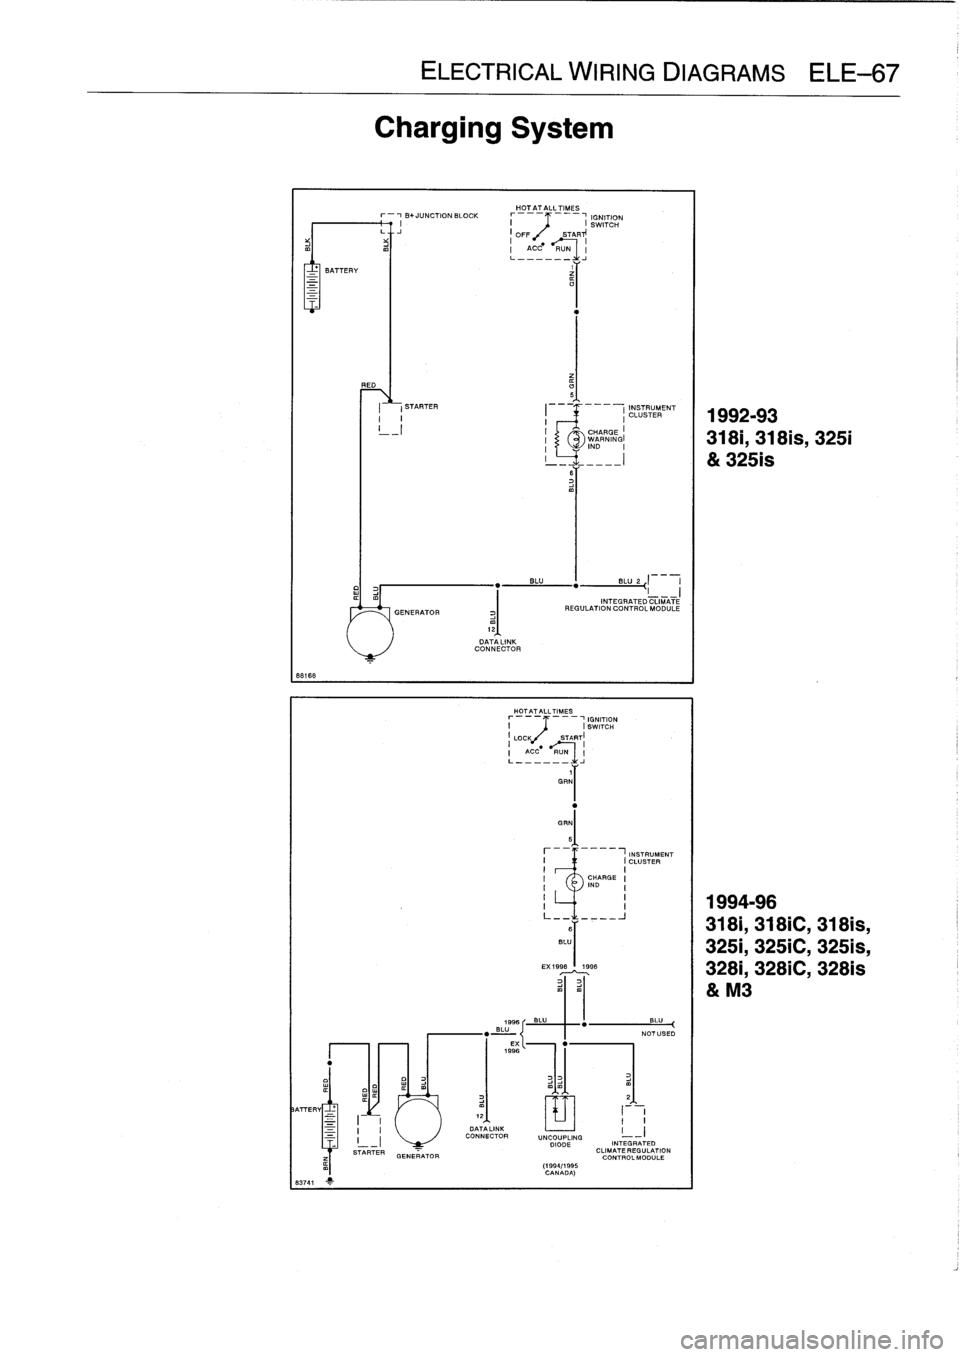 2000 Bmw Z3 Speaker Wiring Diagram Reveolution Of E46 Factory Diagrams Fuse Locations Nissan Maxima E36